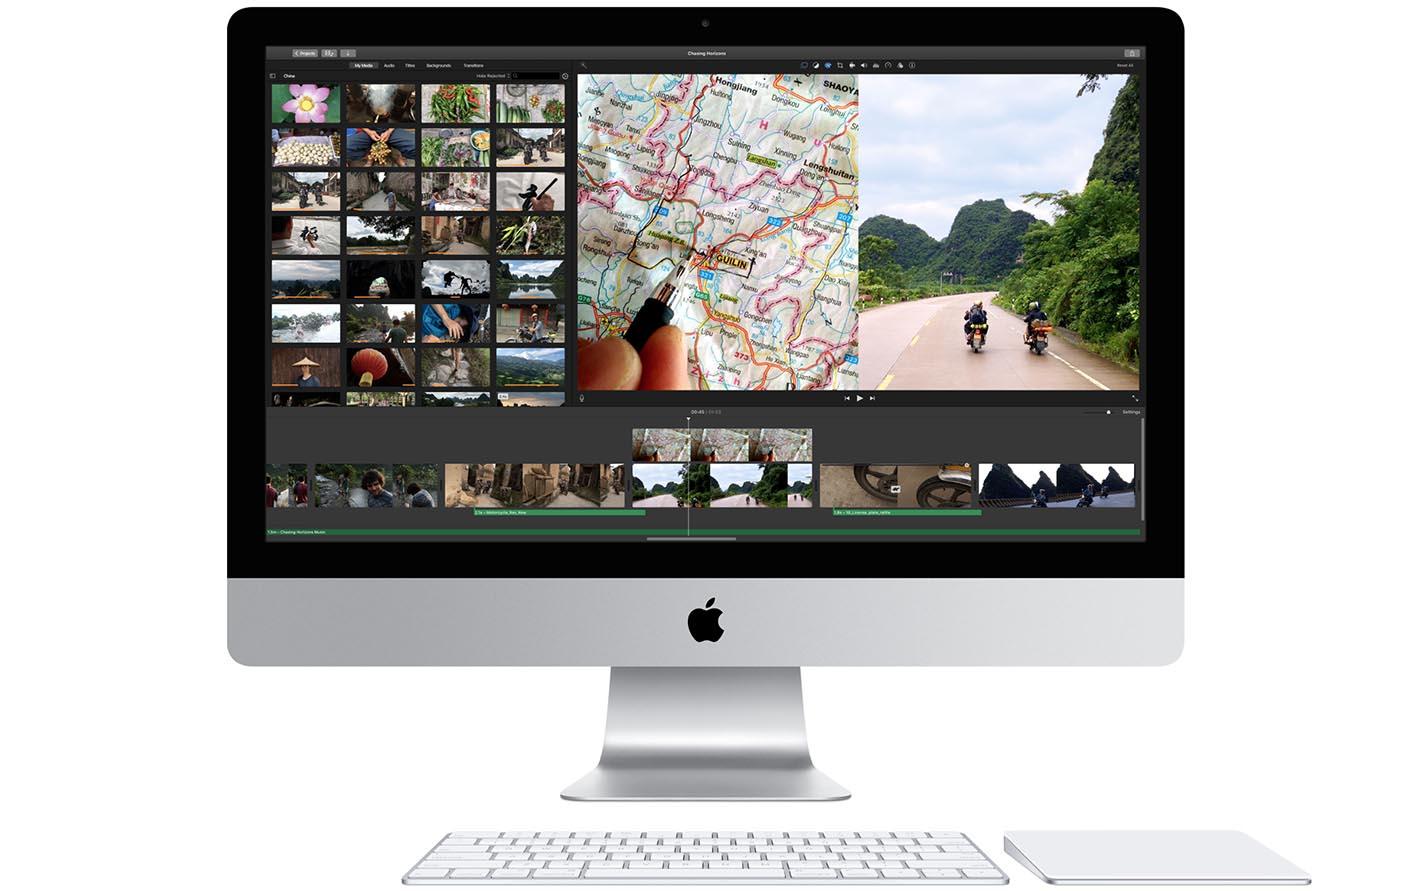 iMac clavier trackpad